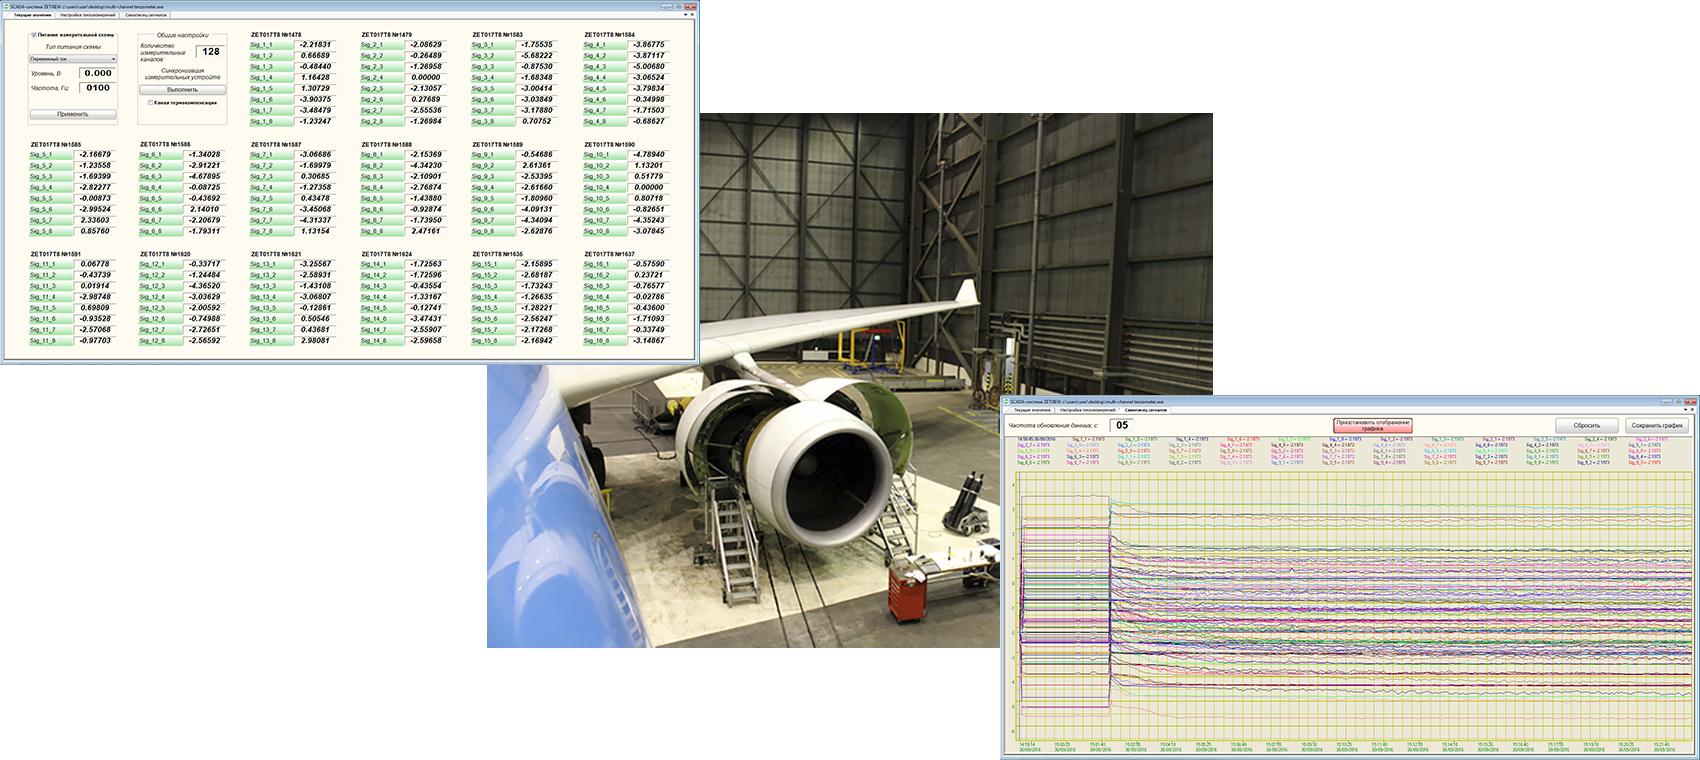 Multichannel-strain-measurement-systems